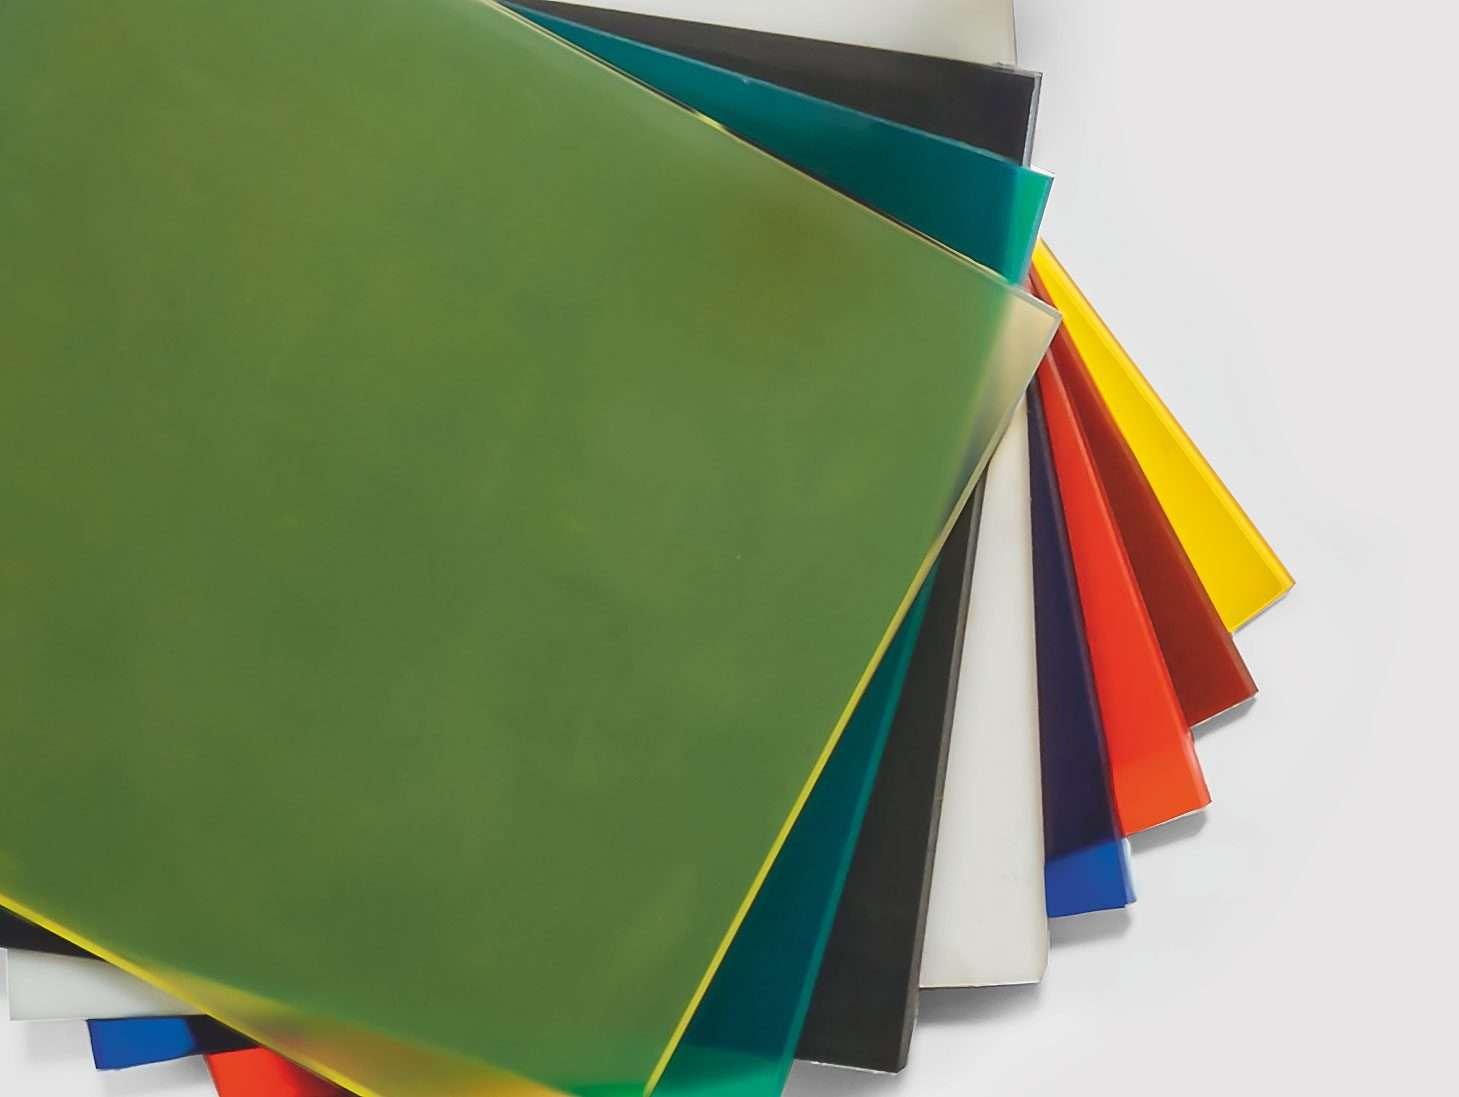 Platten mit individuellen Sondermaßen / Sheets - individual designed